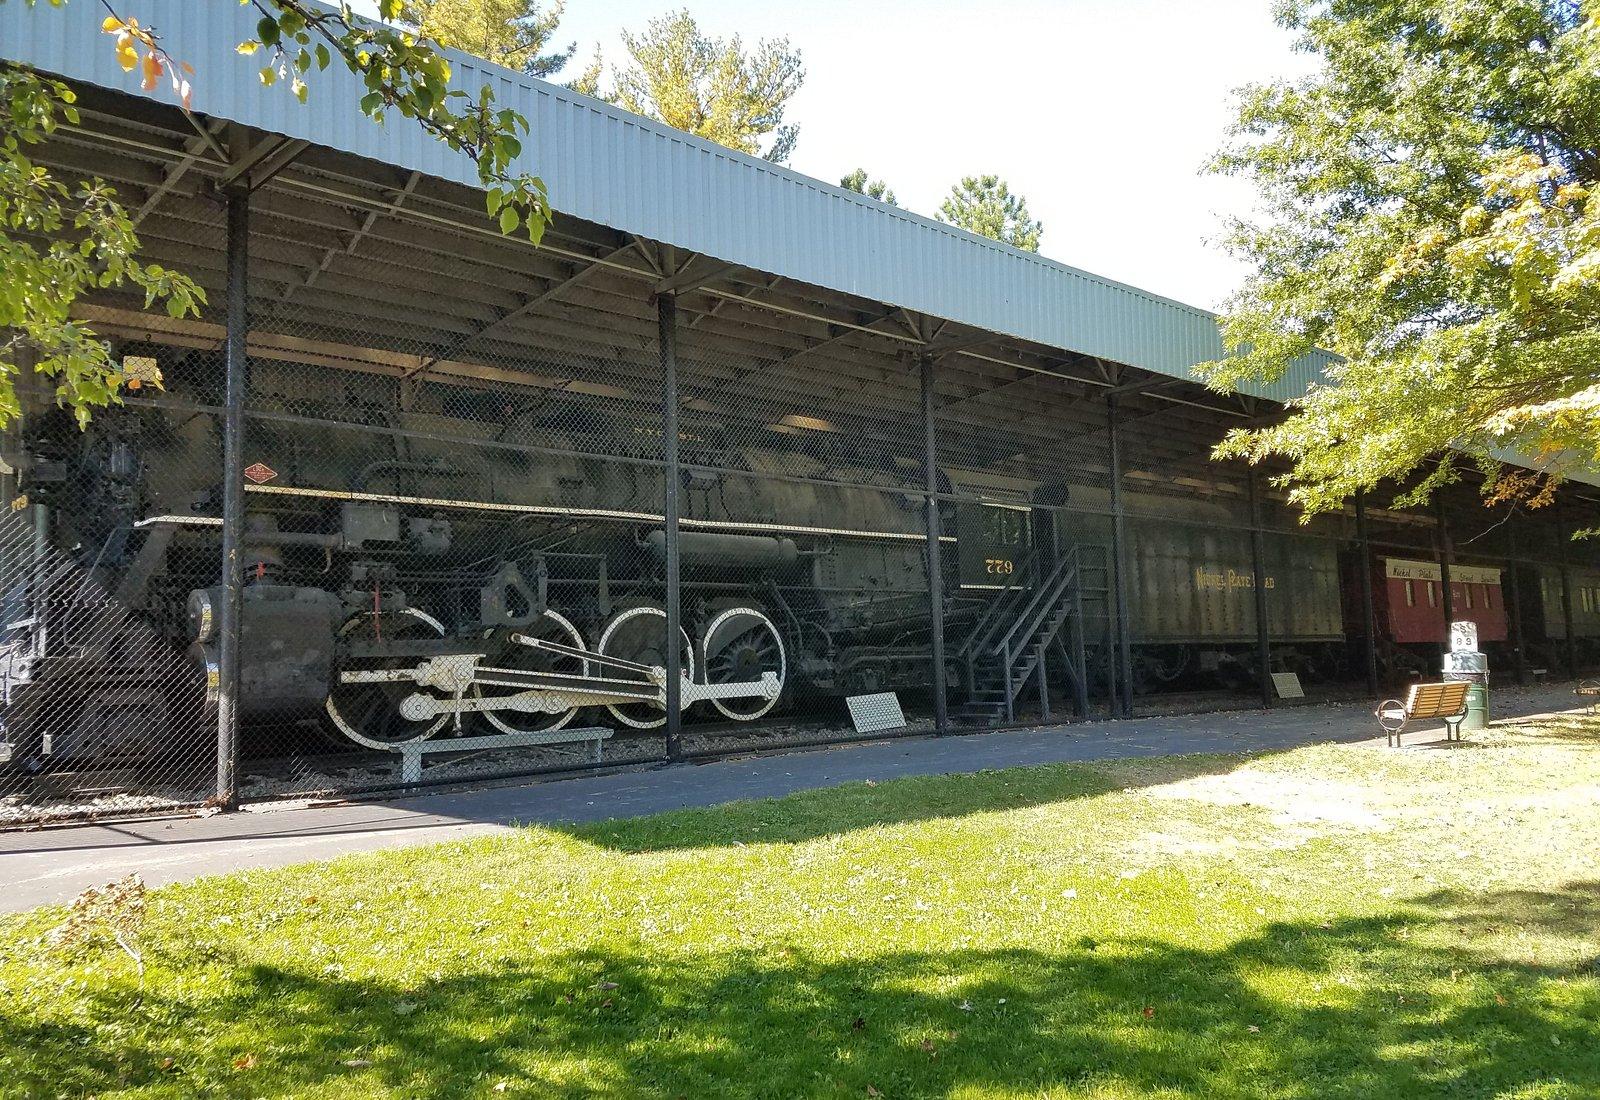 Lincoln Park Railway Exhibit